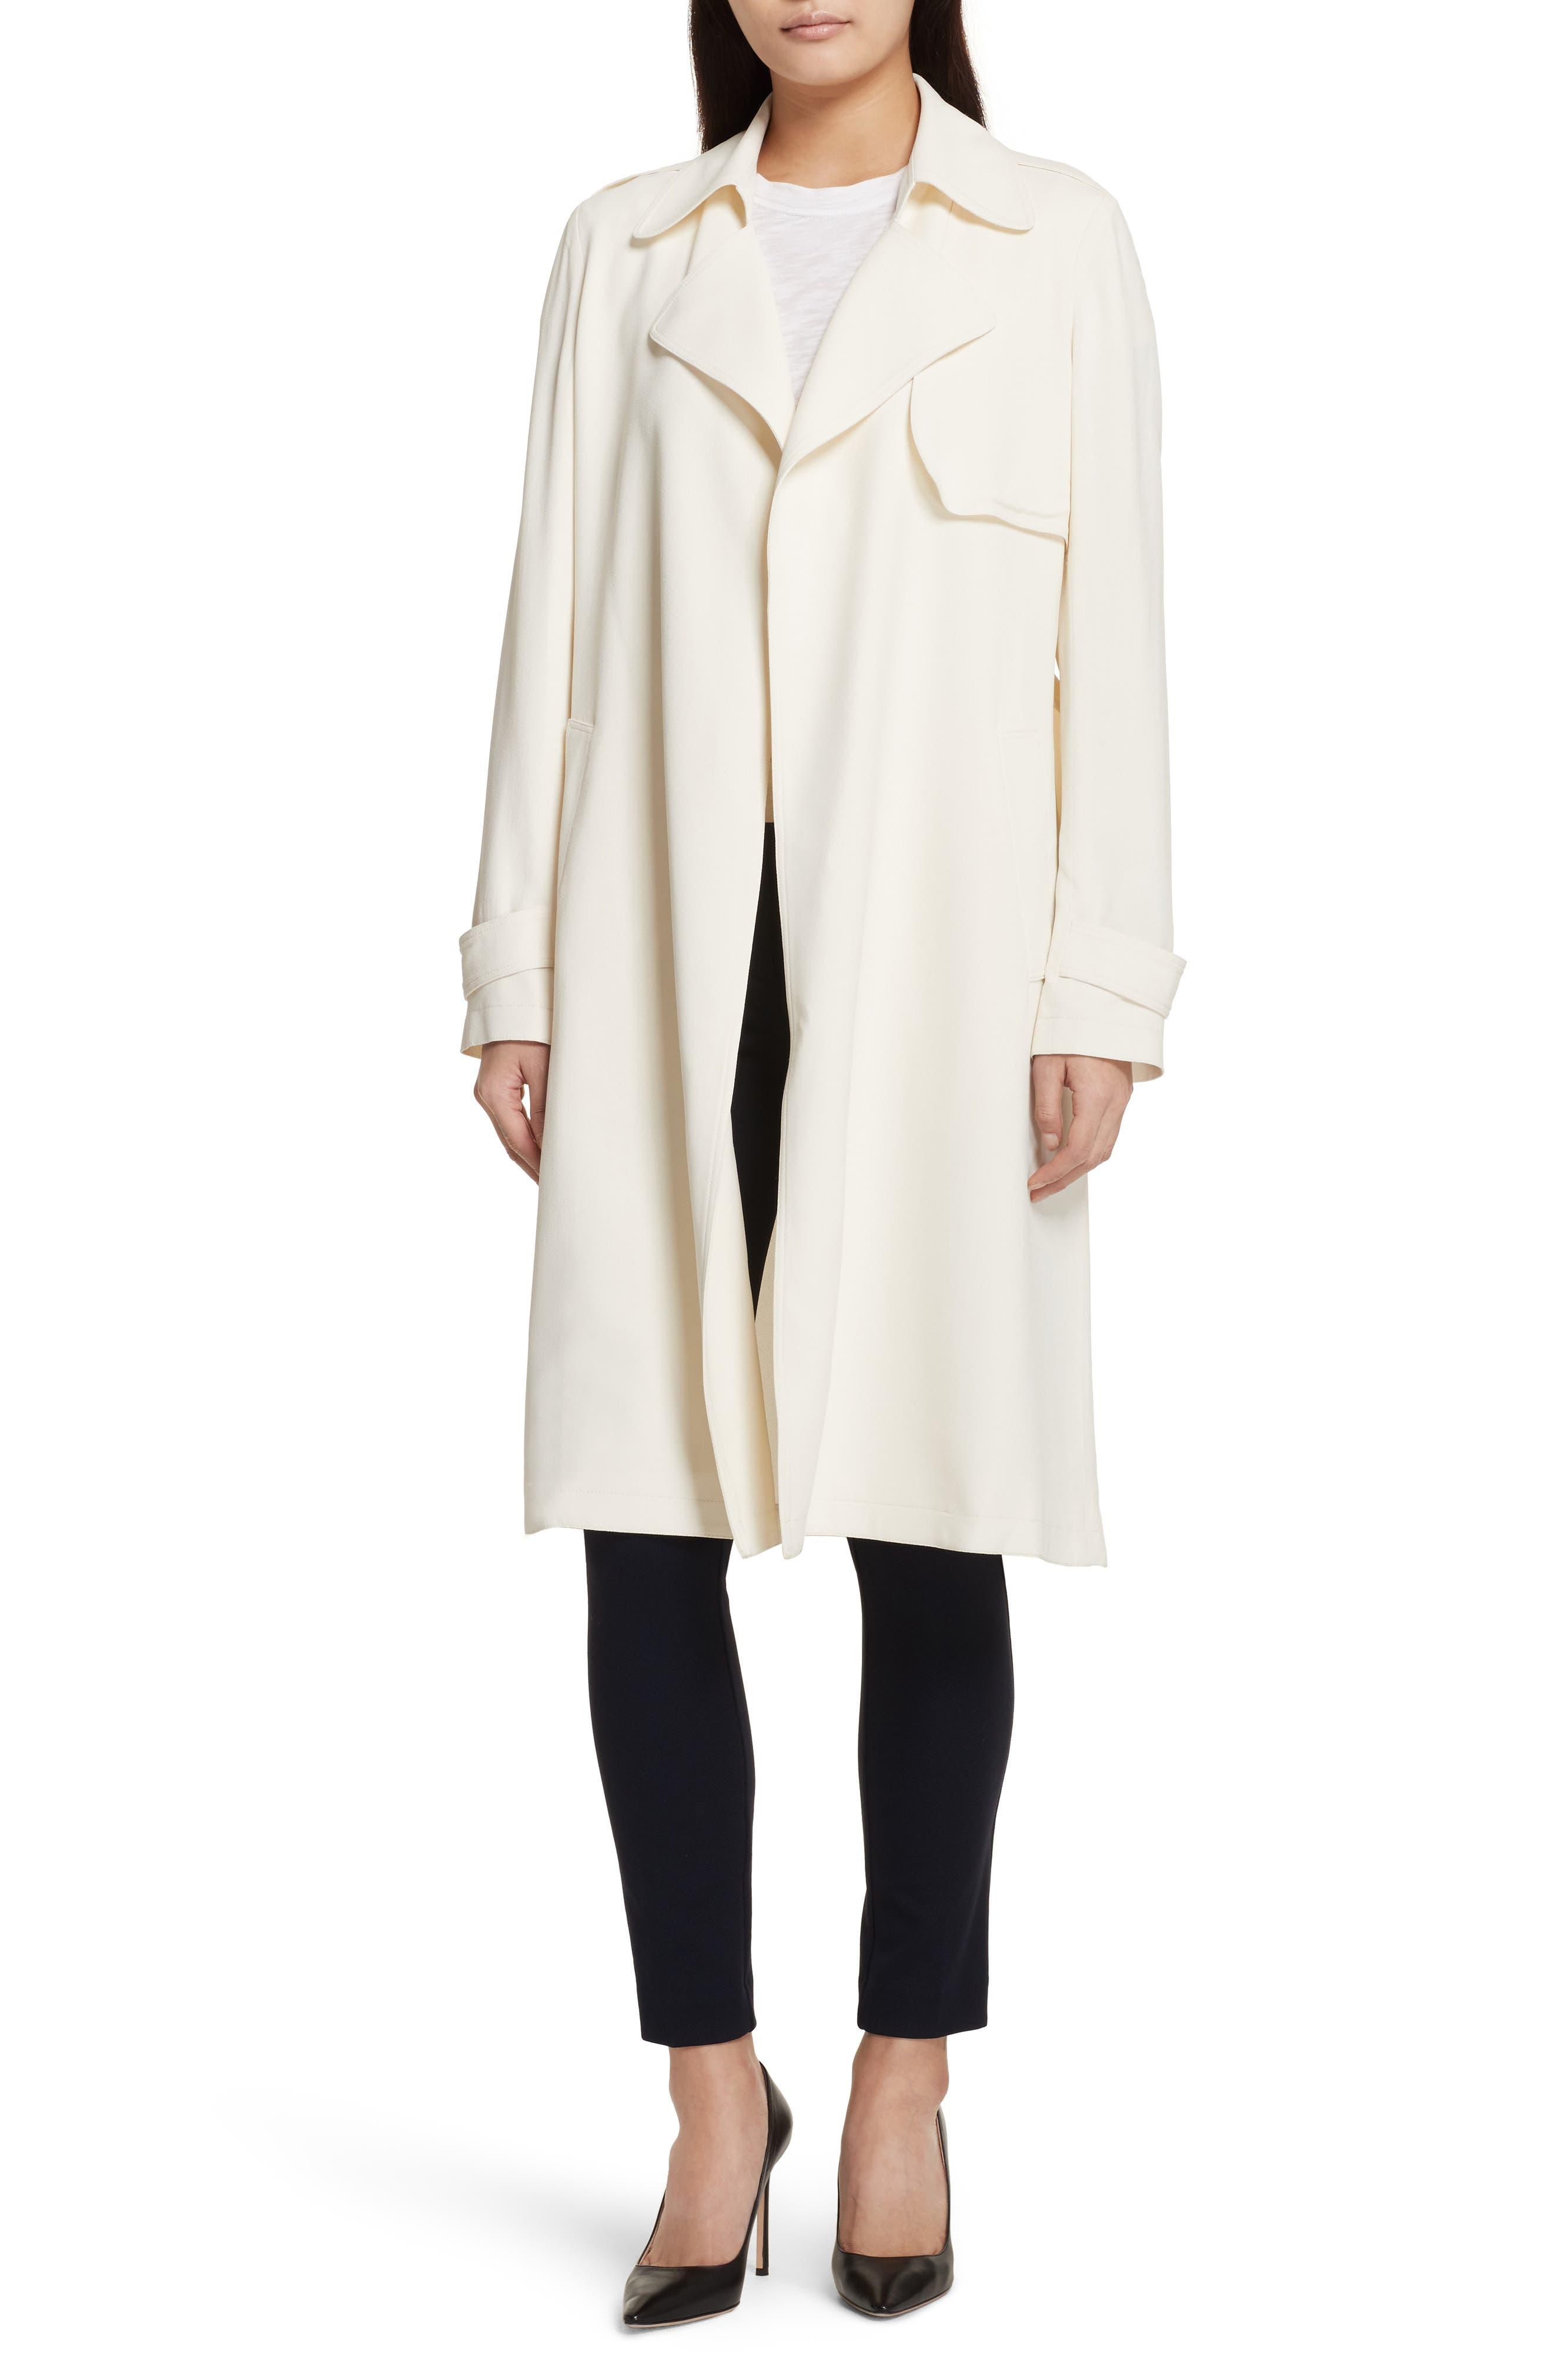 Oaklane Rosina Crepe Trench Coat,                             Main thumbnail 1, color,                             Ivory